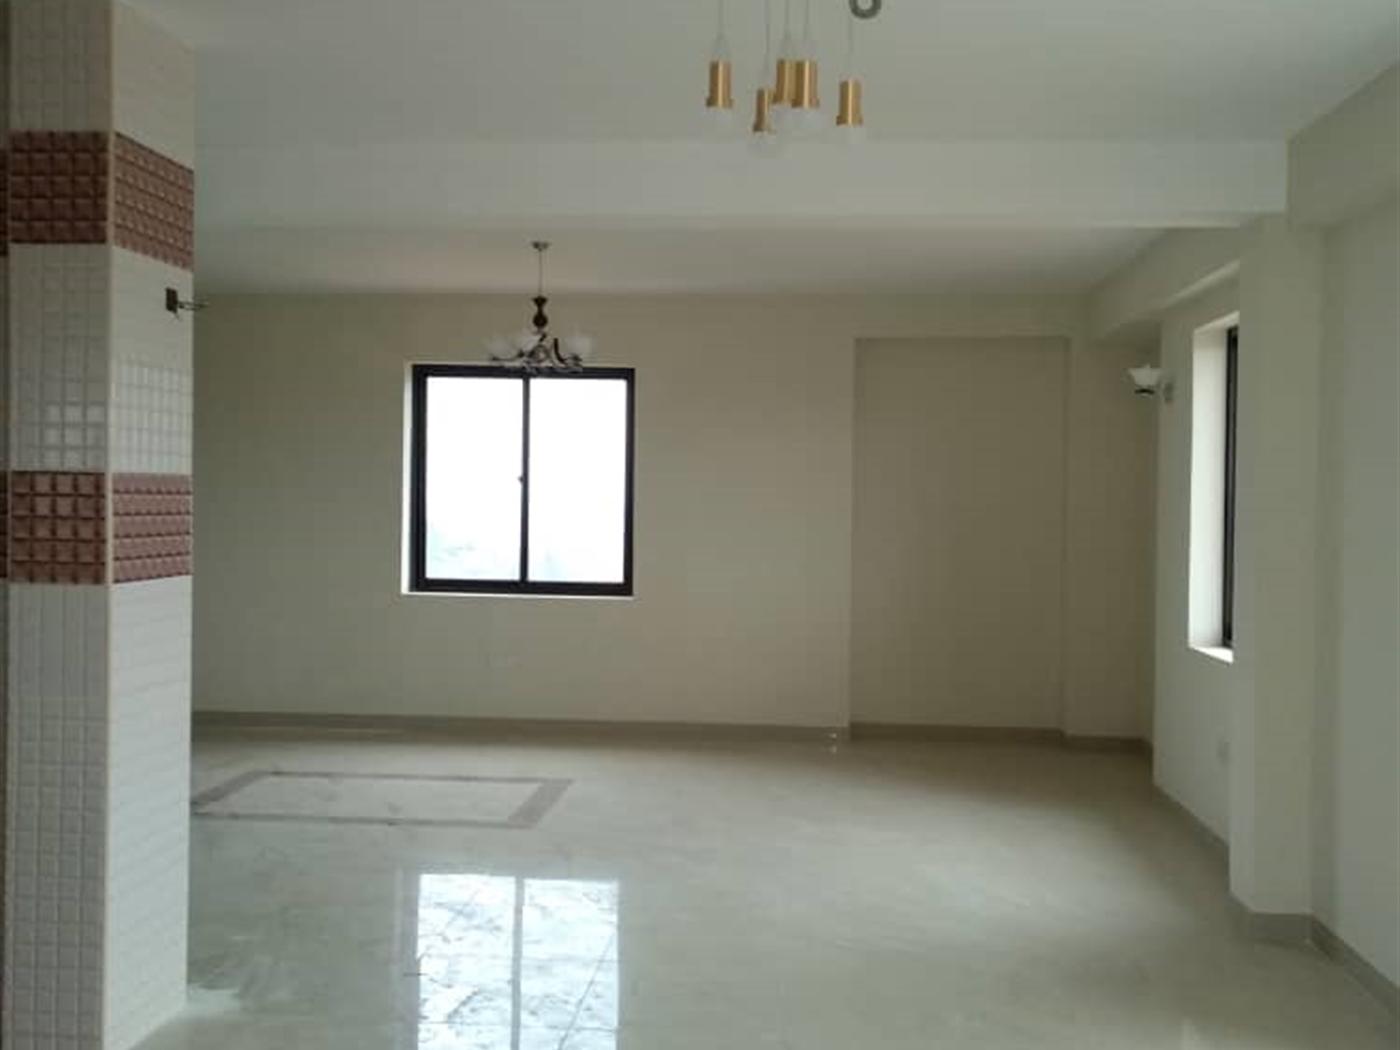 Apartment for rent in Kamwokya Kampala